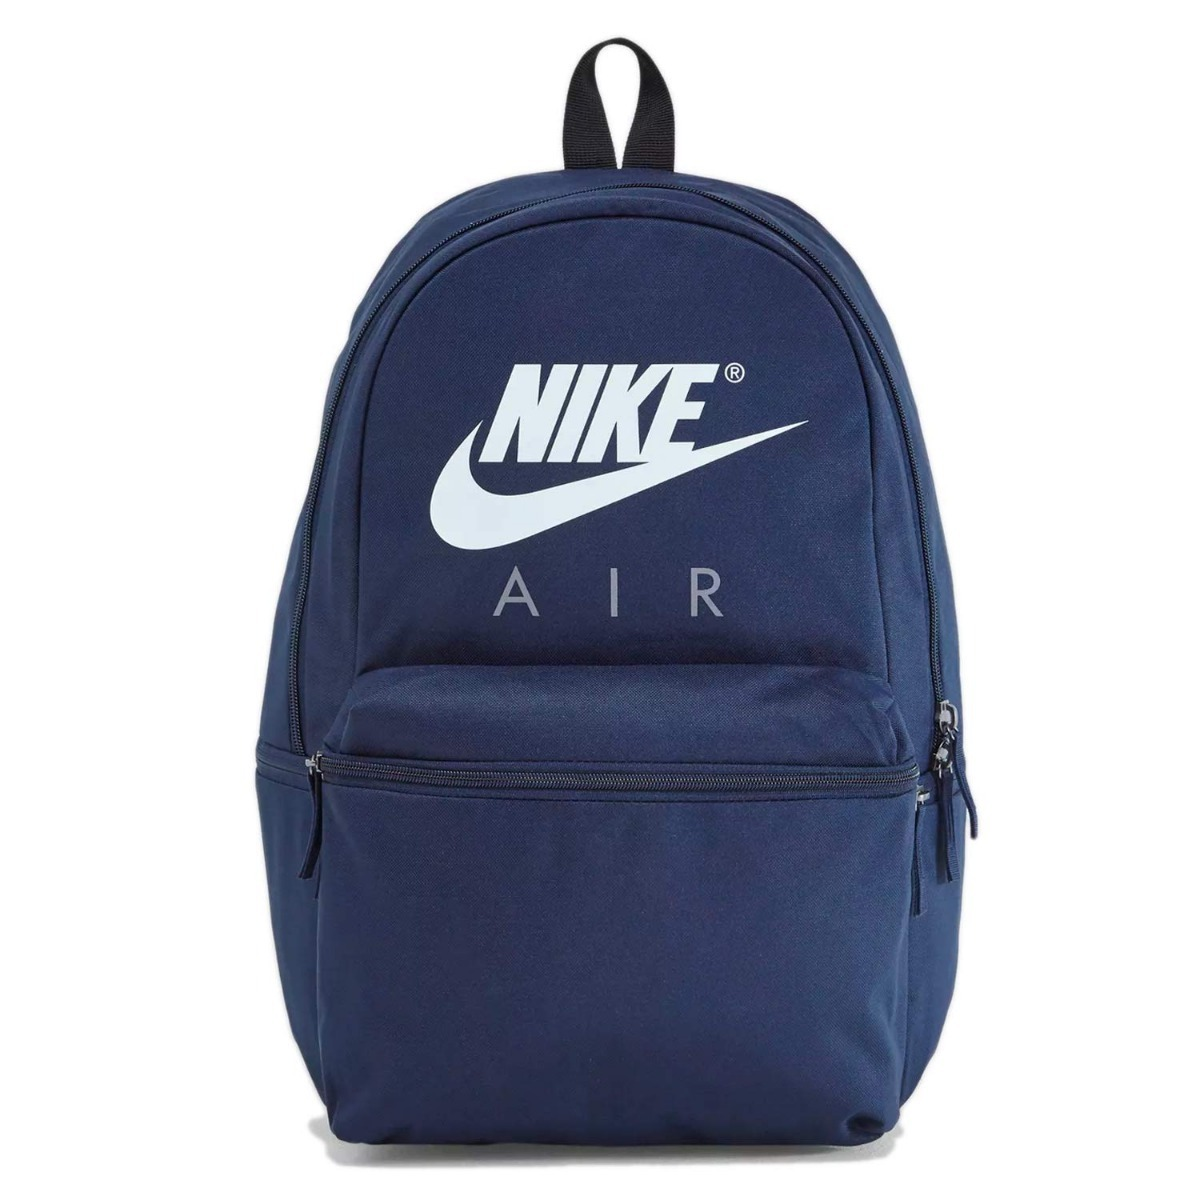 Azul Backpack Marino Mochila Air Color Nike Hombre Casual TqPwXaU